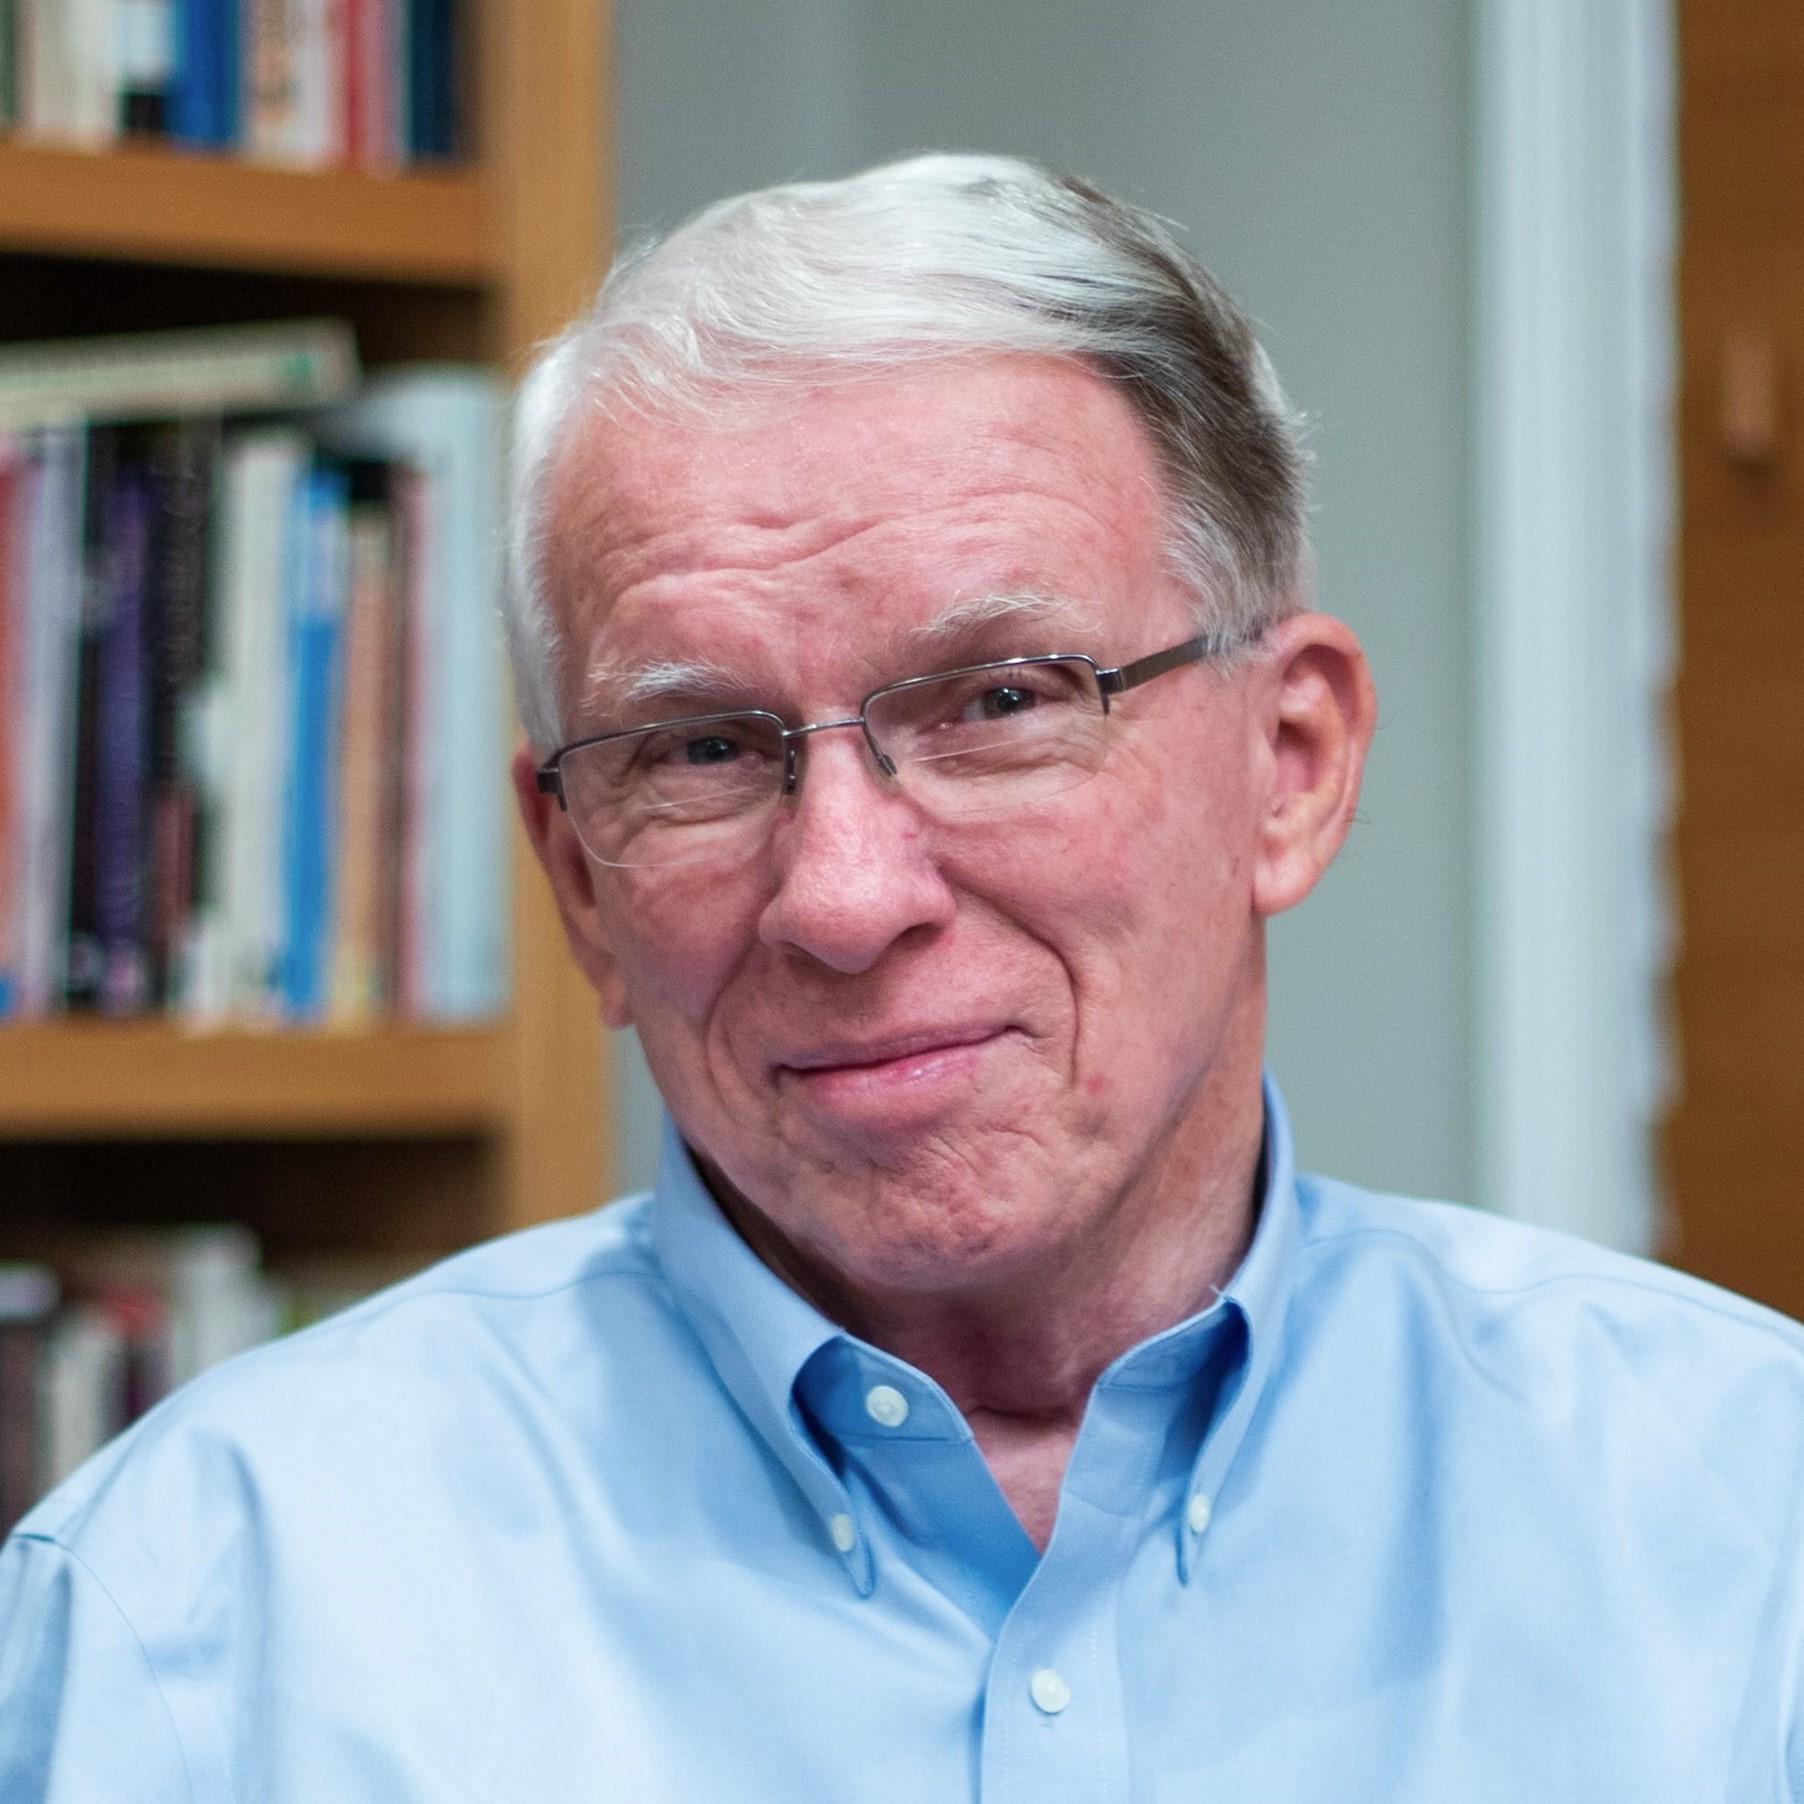 Dr. Larry Crabb's headshot